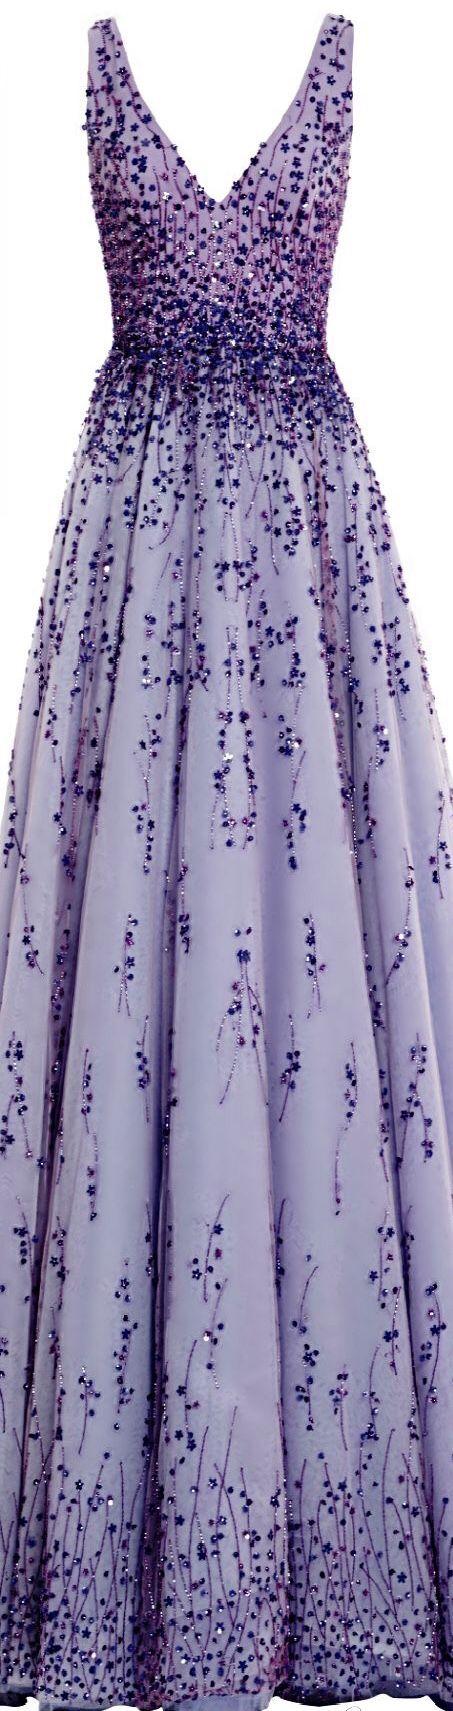 Pin de Uschi Ferguson en Purple   Pinterest   Púrpura, Lavanda y ...